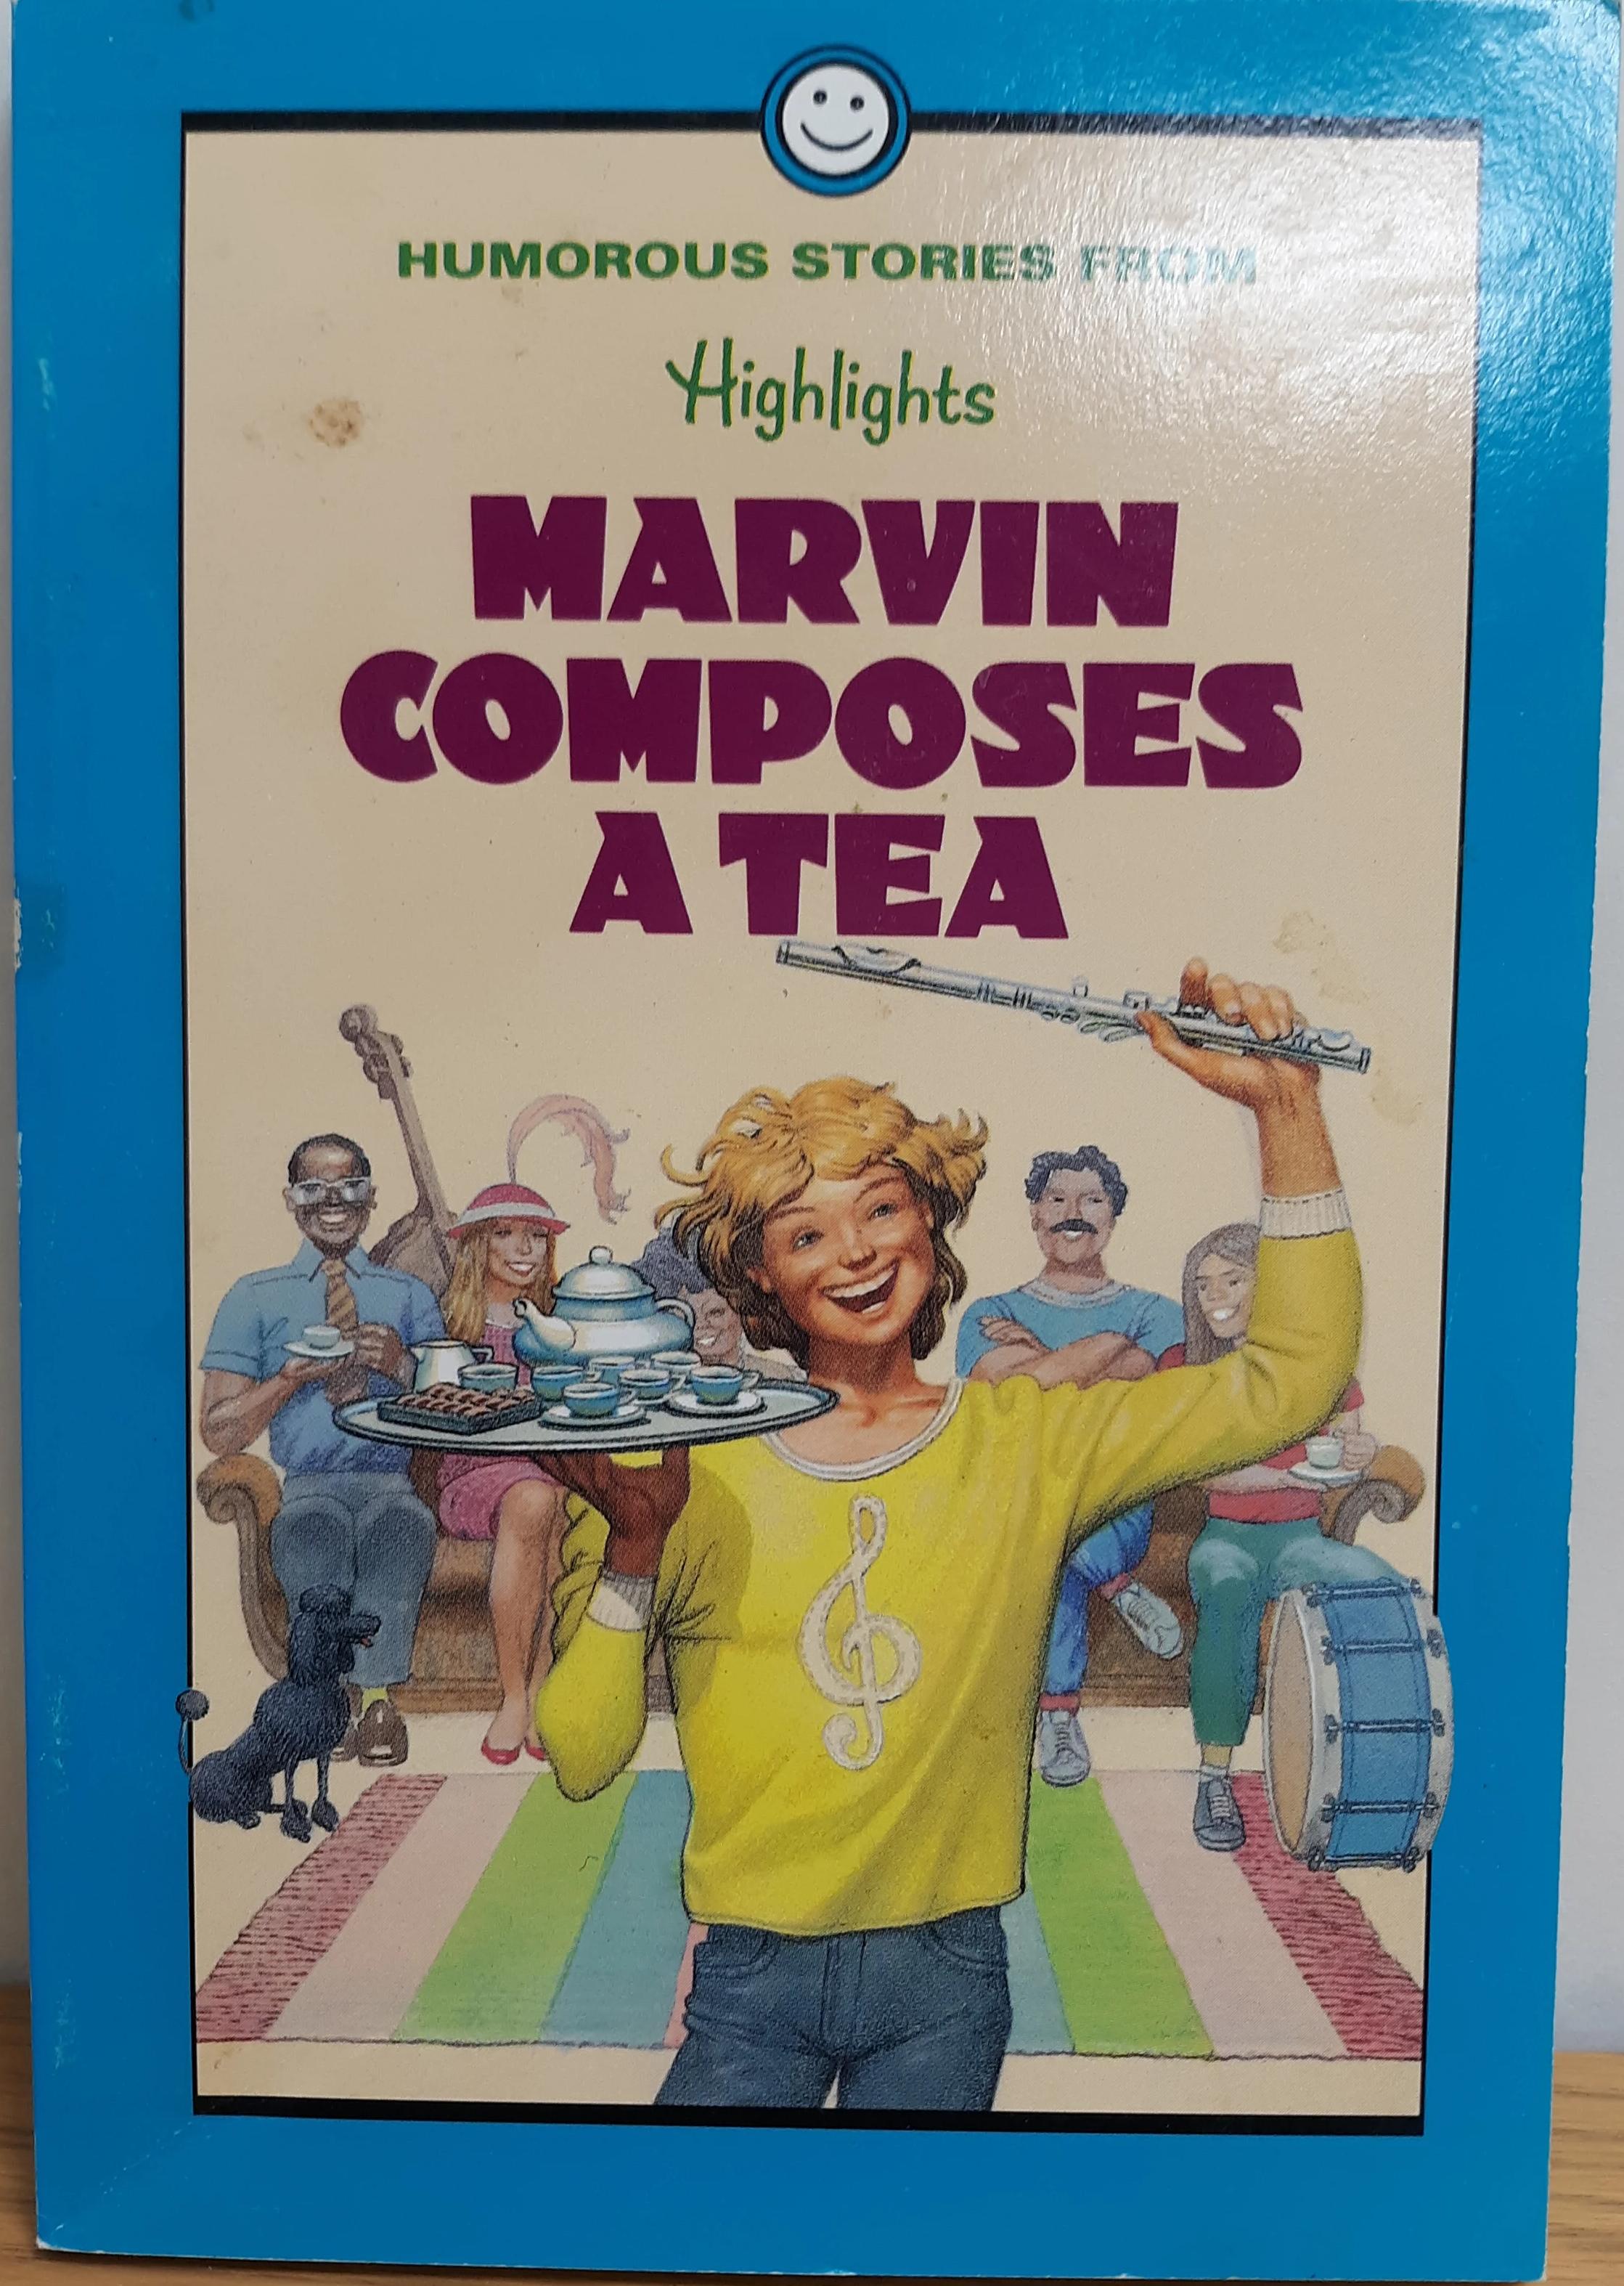 https://0201.nccdn.net/1_2/000/000/099/3be/marvin-composes-a-tea.png